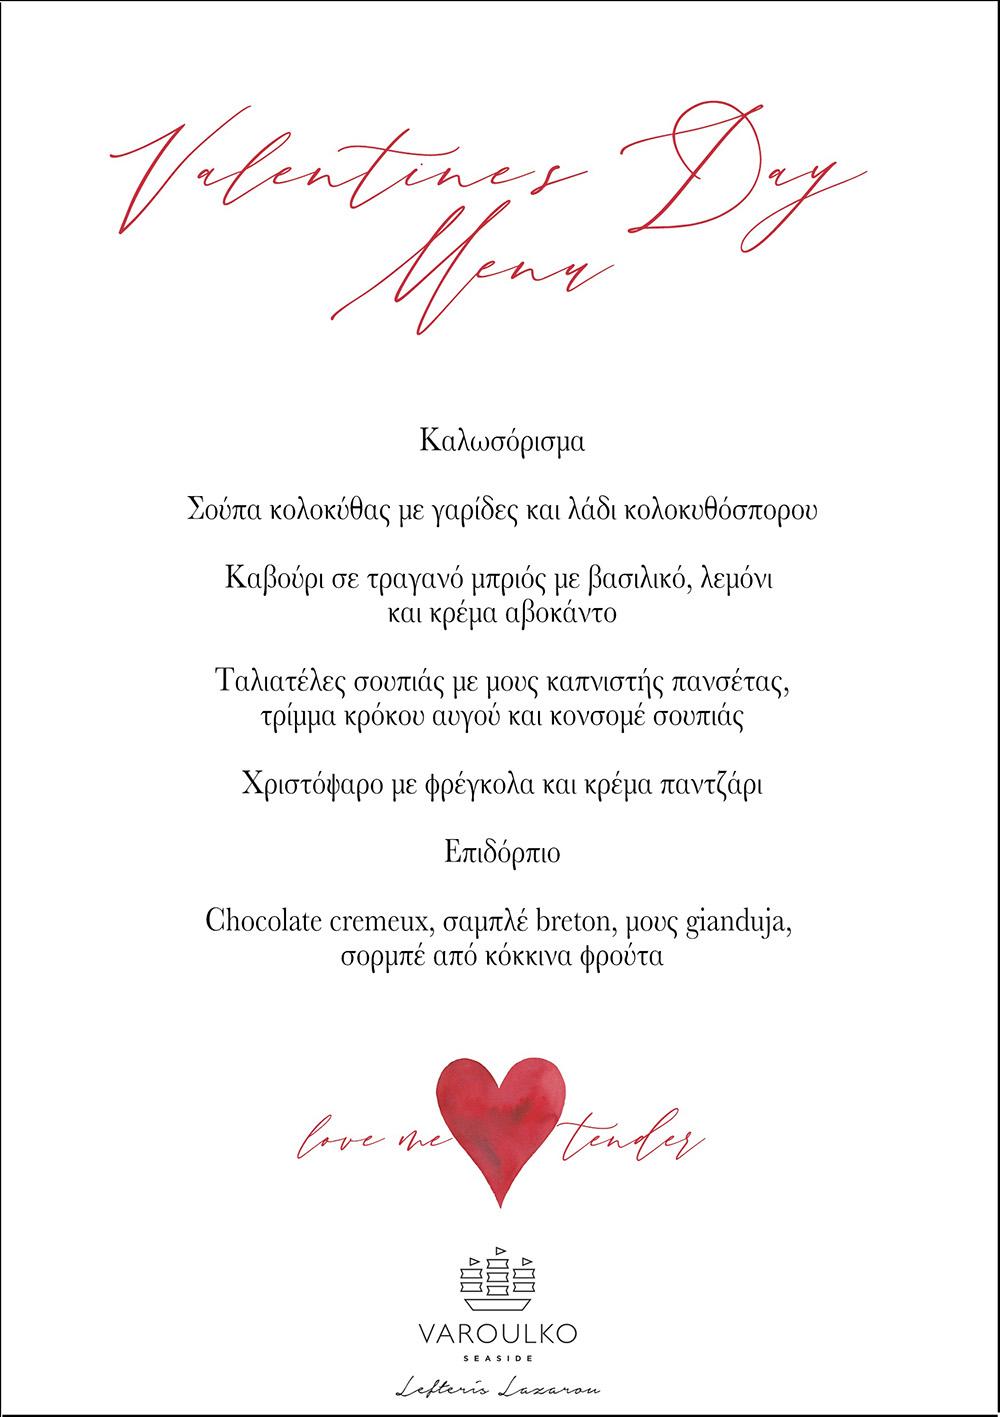 Varoulko Valentine menu 2020